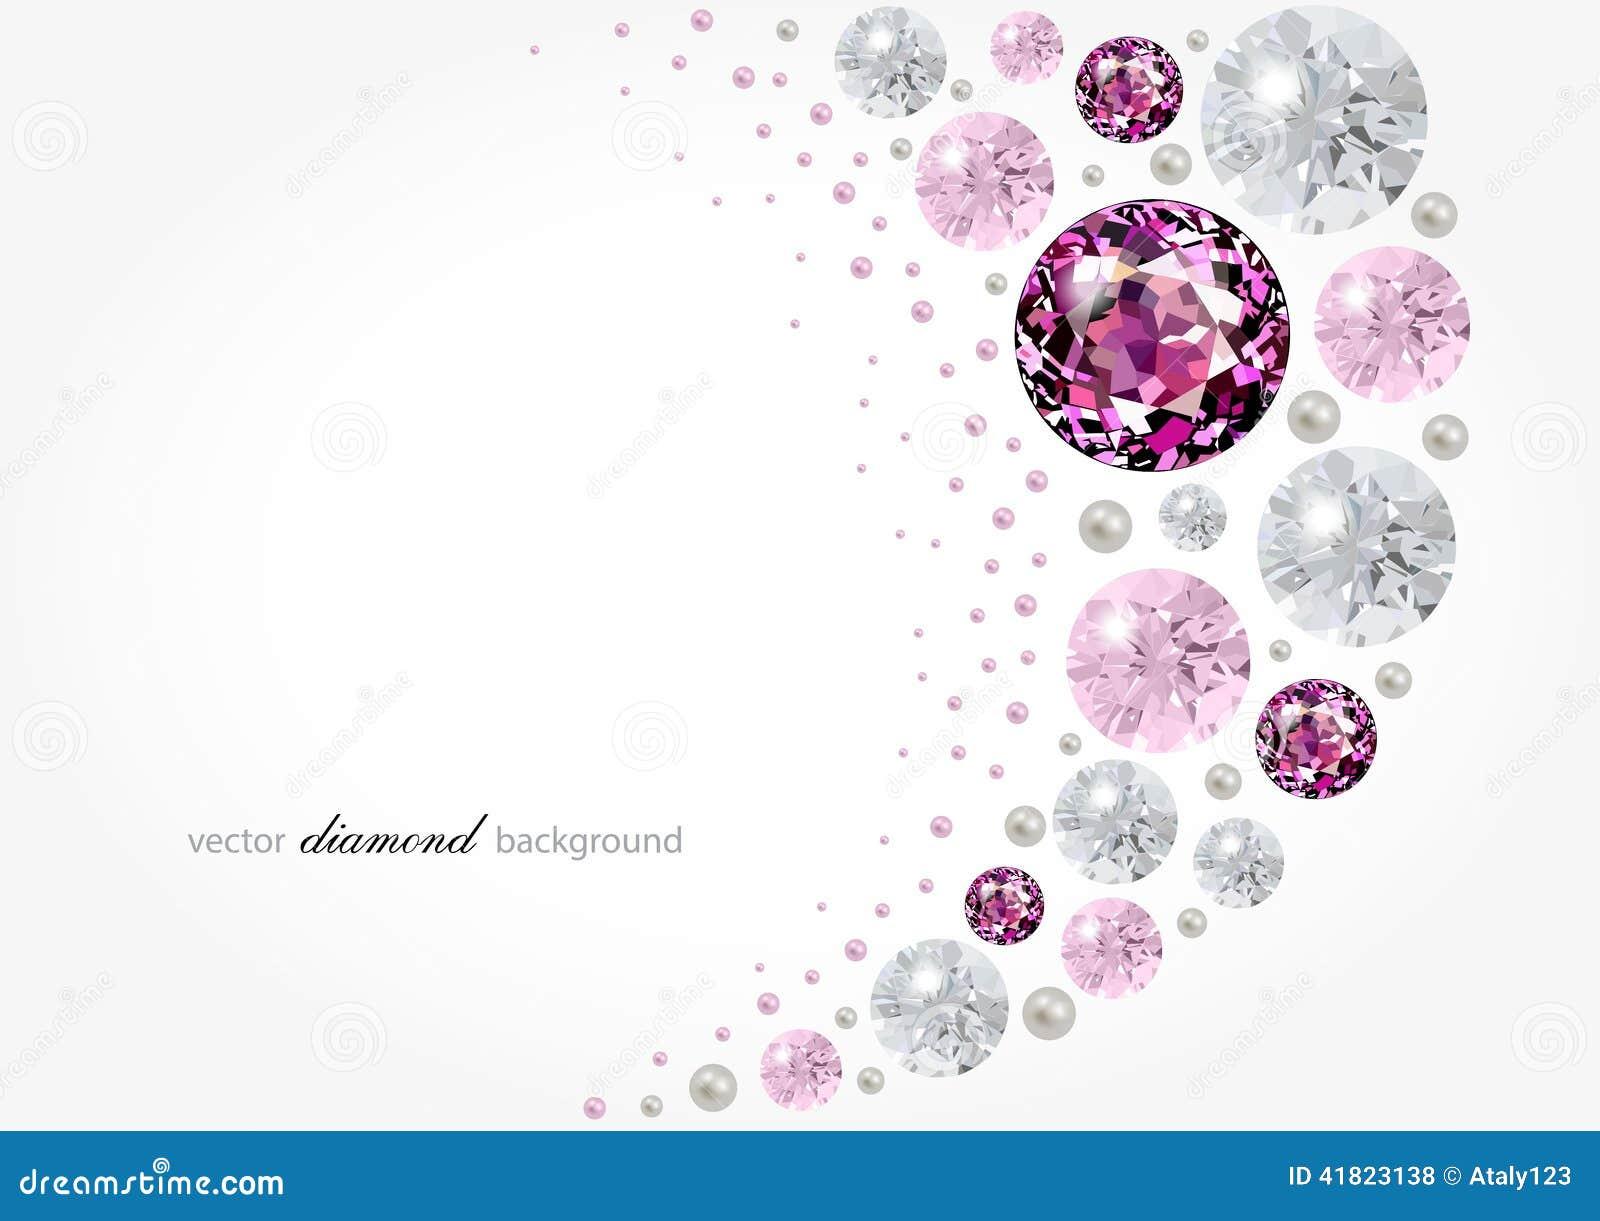 diamond background stock vector illustration of wallpaper 41823138